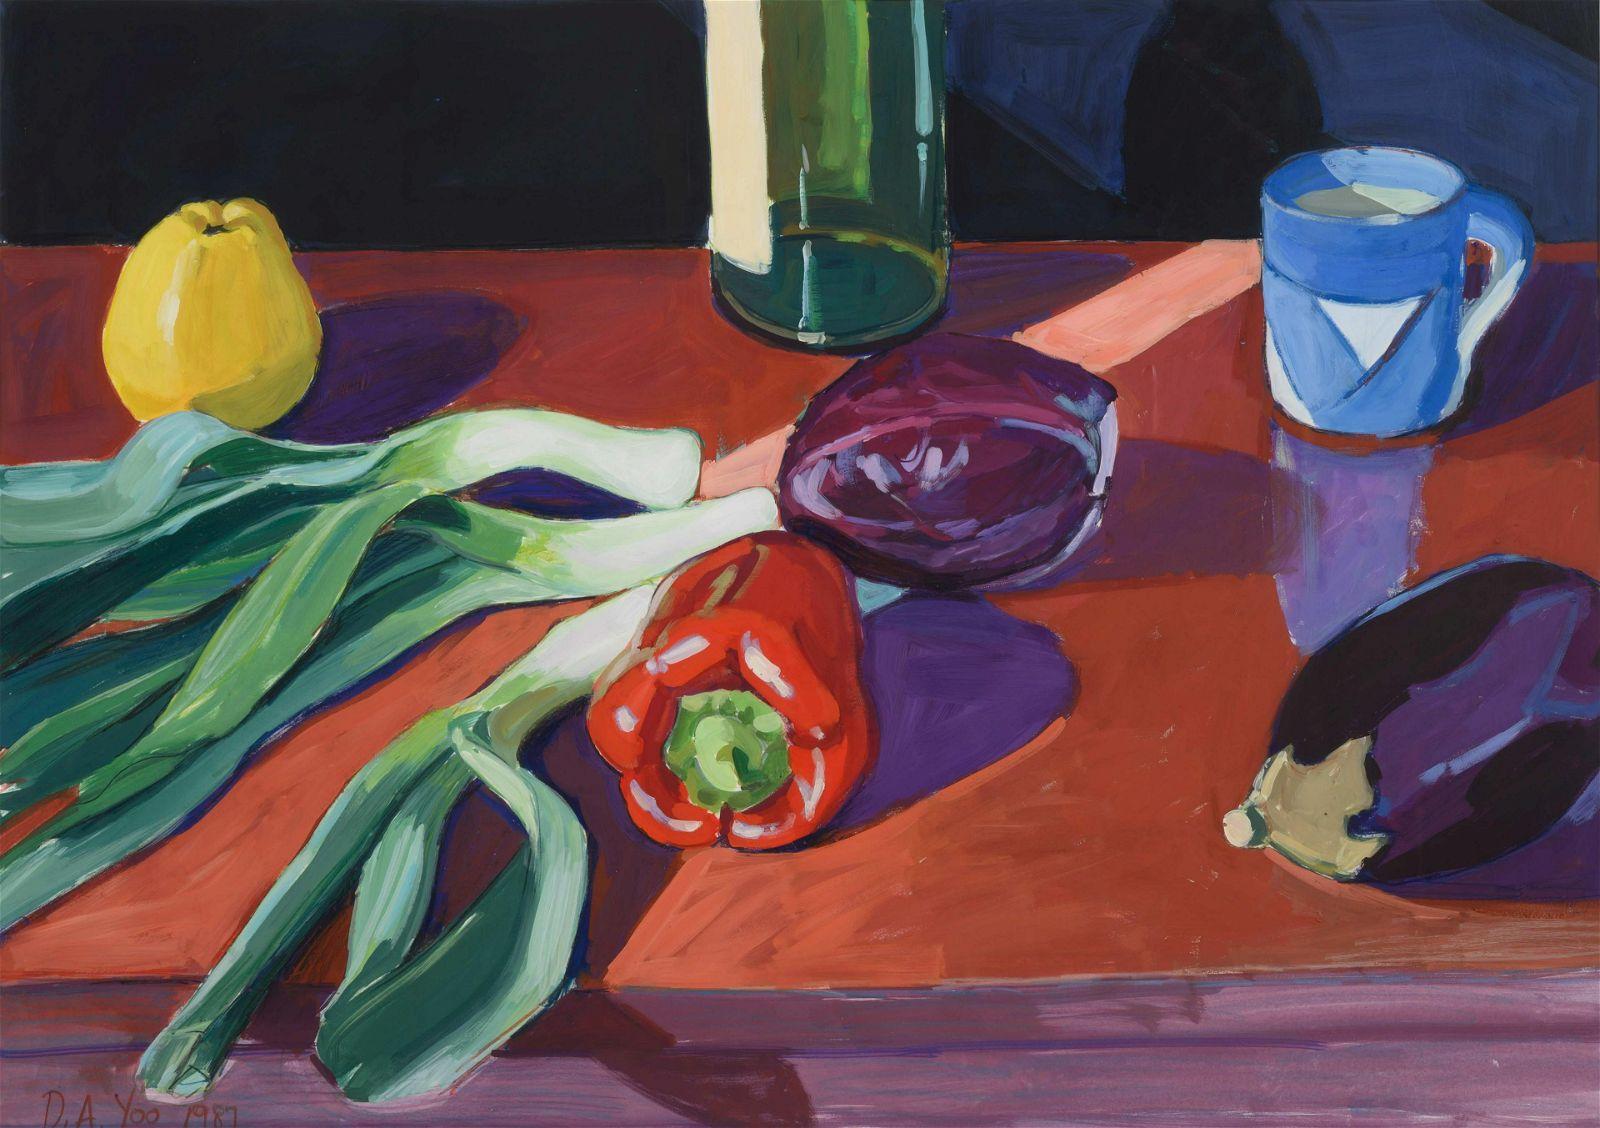 Debra A. Yoo (American, 20th century) Still Life